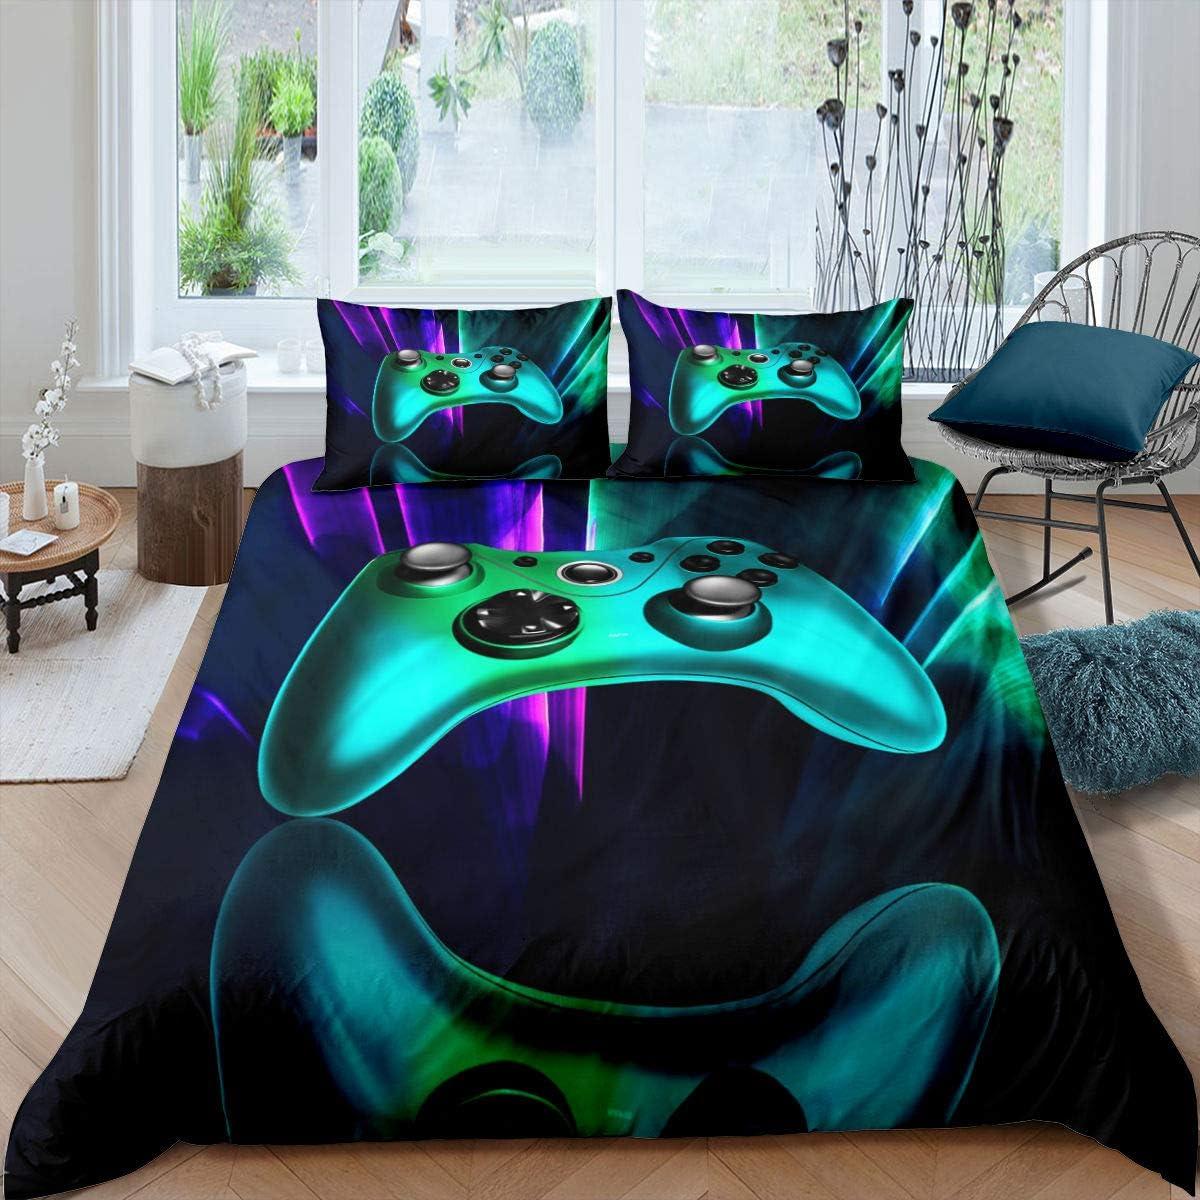 Erosebridal Gaming Bedding Twin Size 3D Green Gamepad Duvet Cover Boys Gamer Gaming Joystick Comforter Cover Set for Kids Teens Games Room Decor, Neon Trippy Trendy Bedding Set, Purple